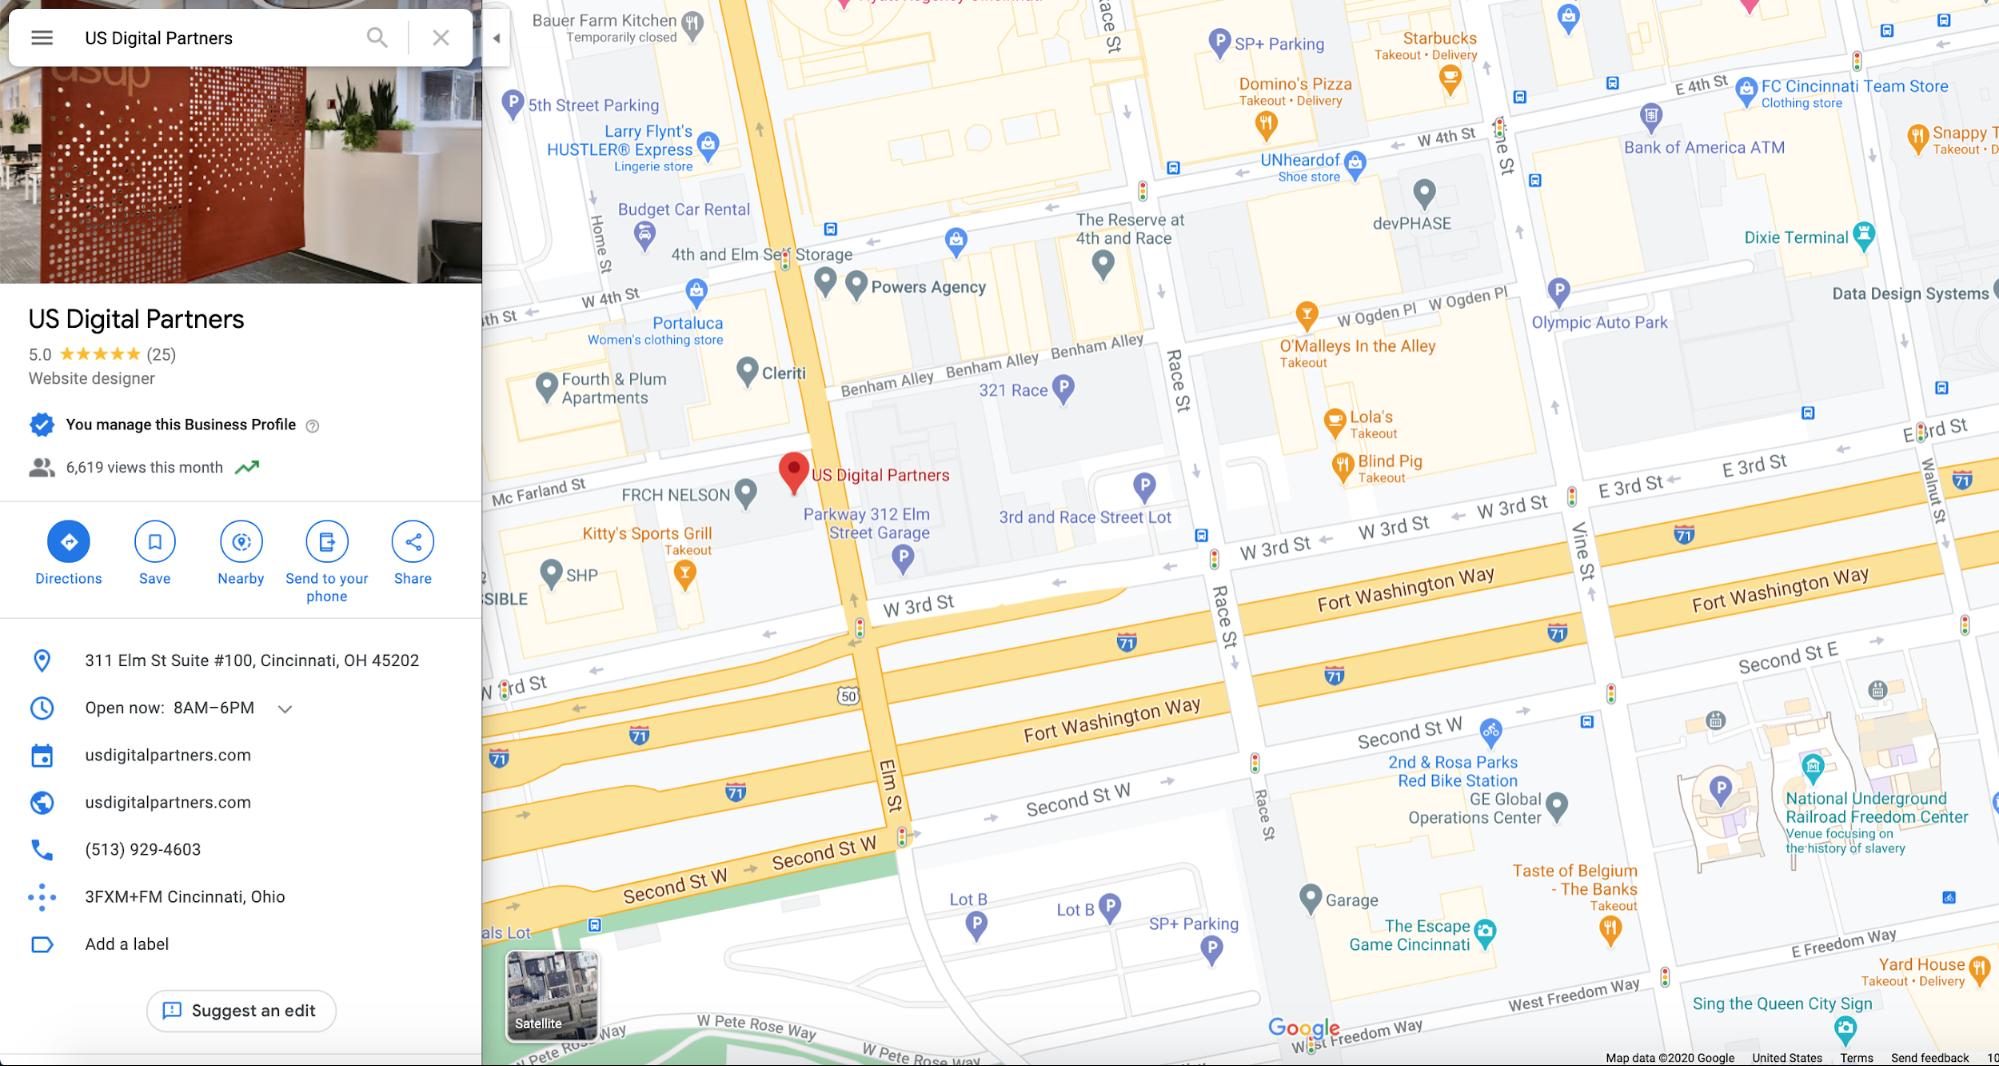 usdp google my business listing on google maps